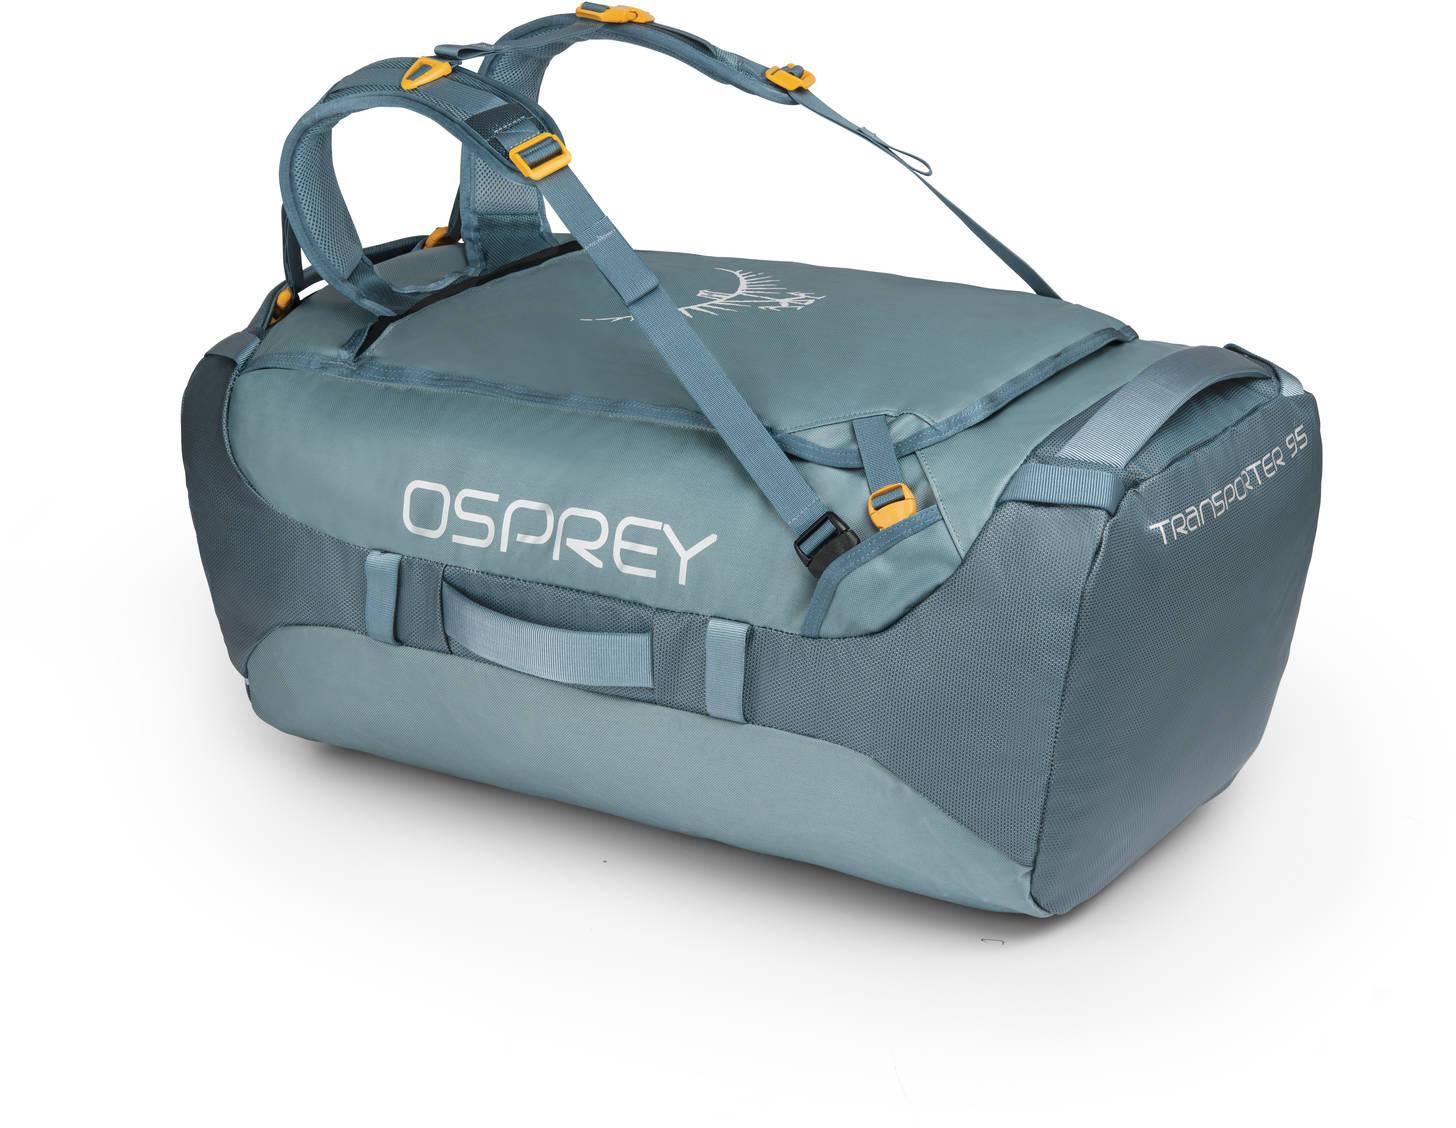 Сумки-рюкзаки Рюкзак-сумка Osprey Transporter 95 Keystone Grey Transporter_95_F17_Side2_Keystone_Grey_web.jpg